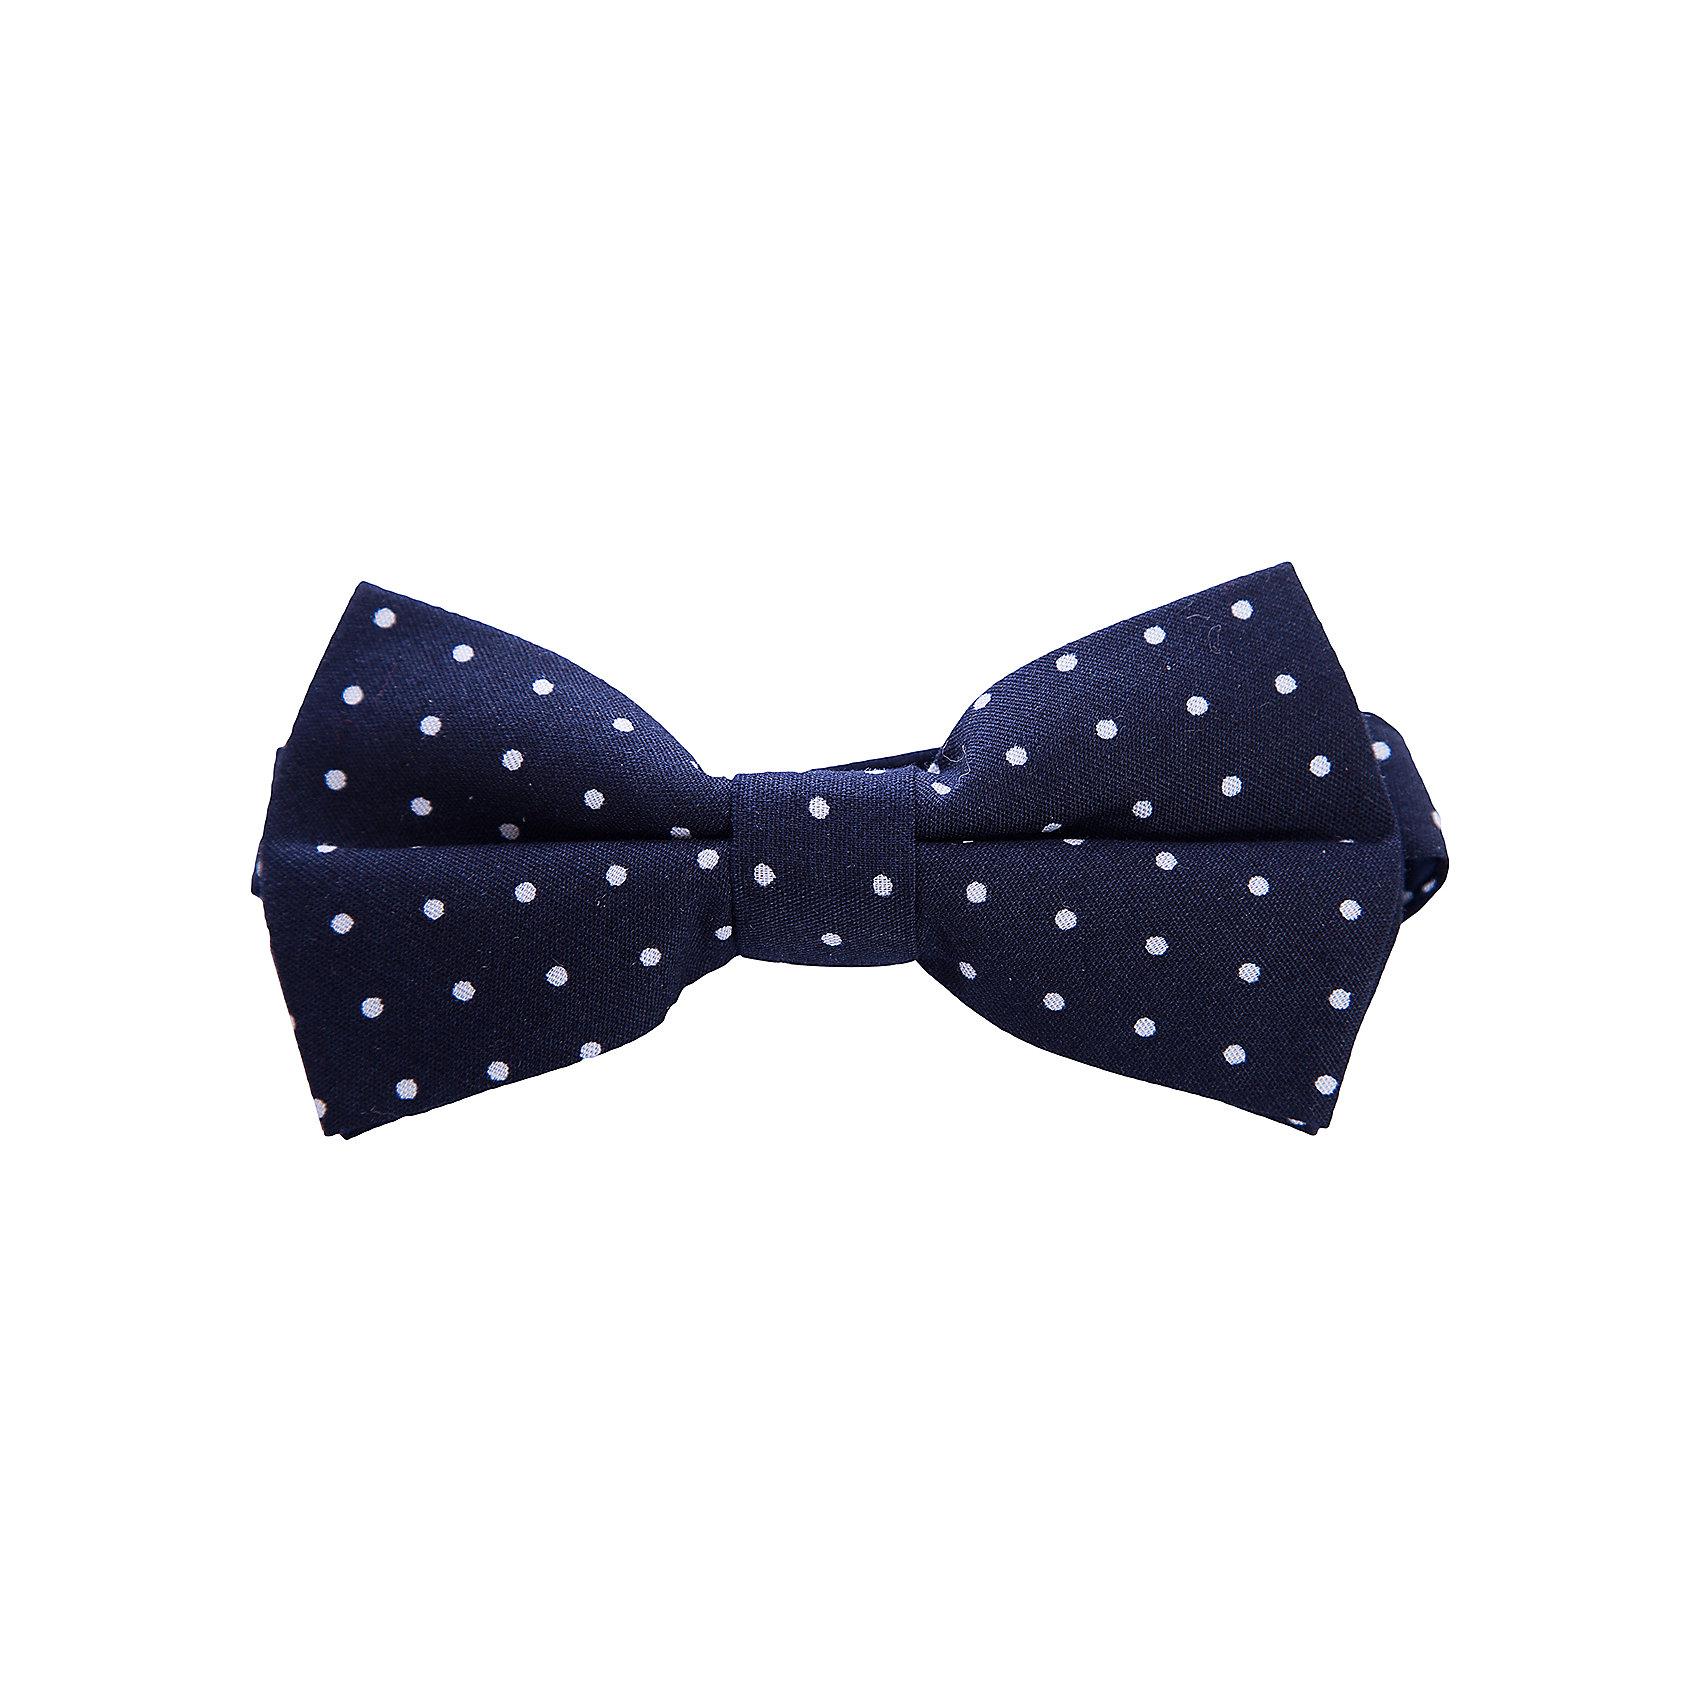 Gulliver Галстук-бабочка для девочки Gulliver галстук бабочка для мальчика 18628 050 синий noble people